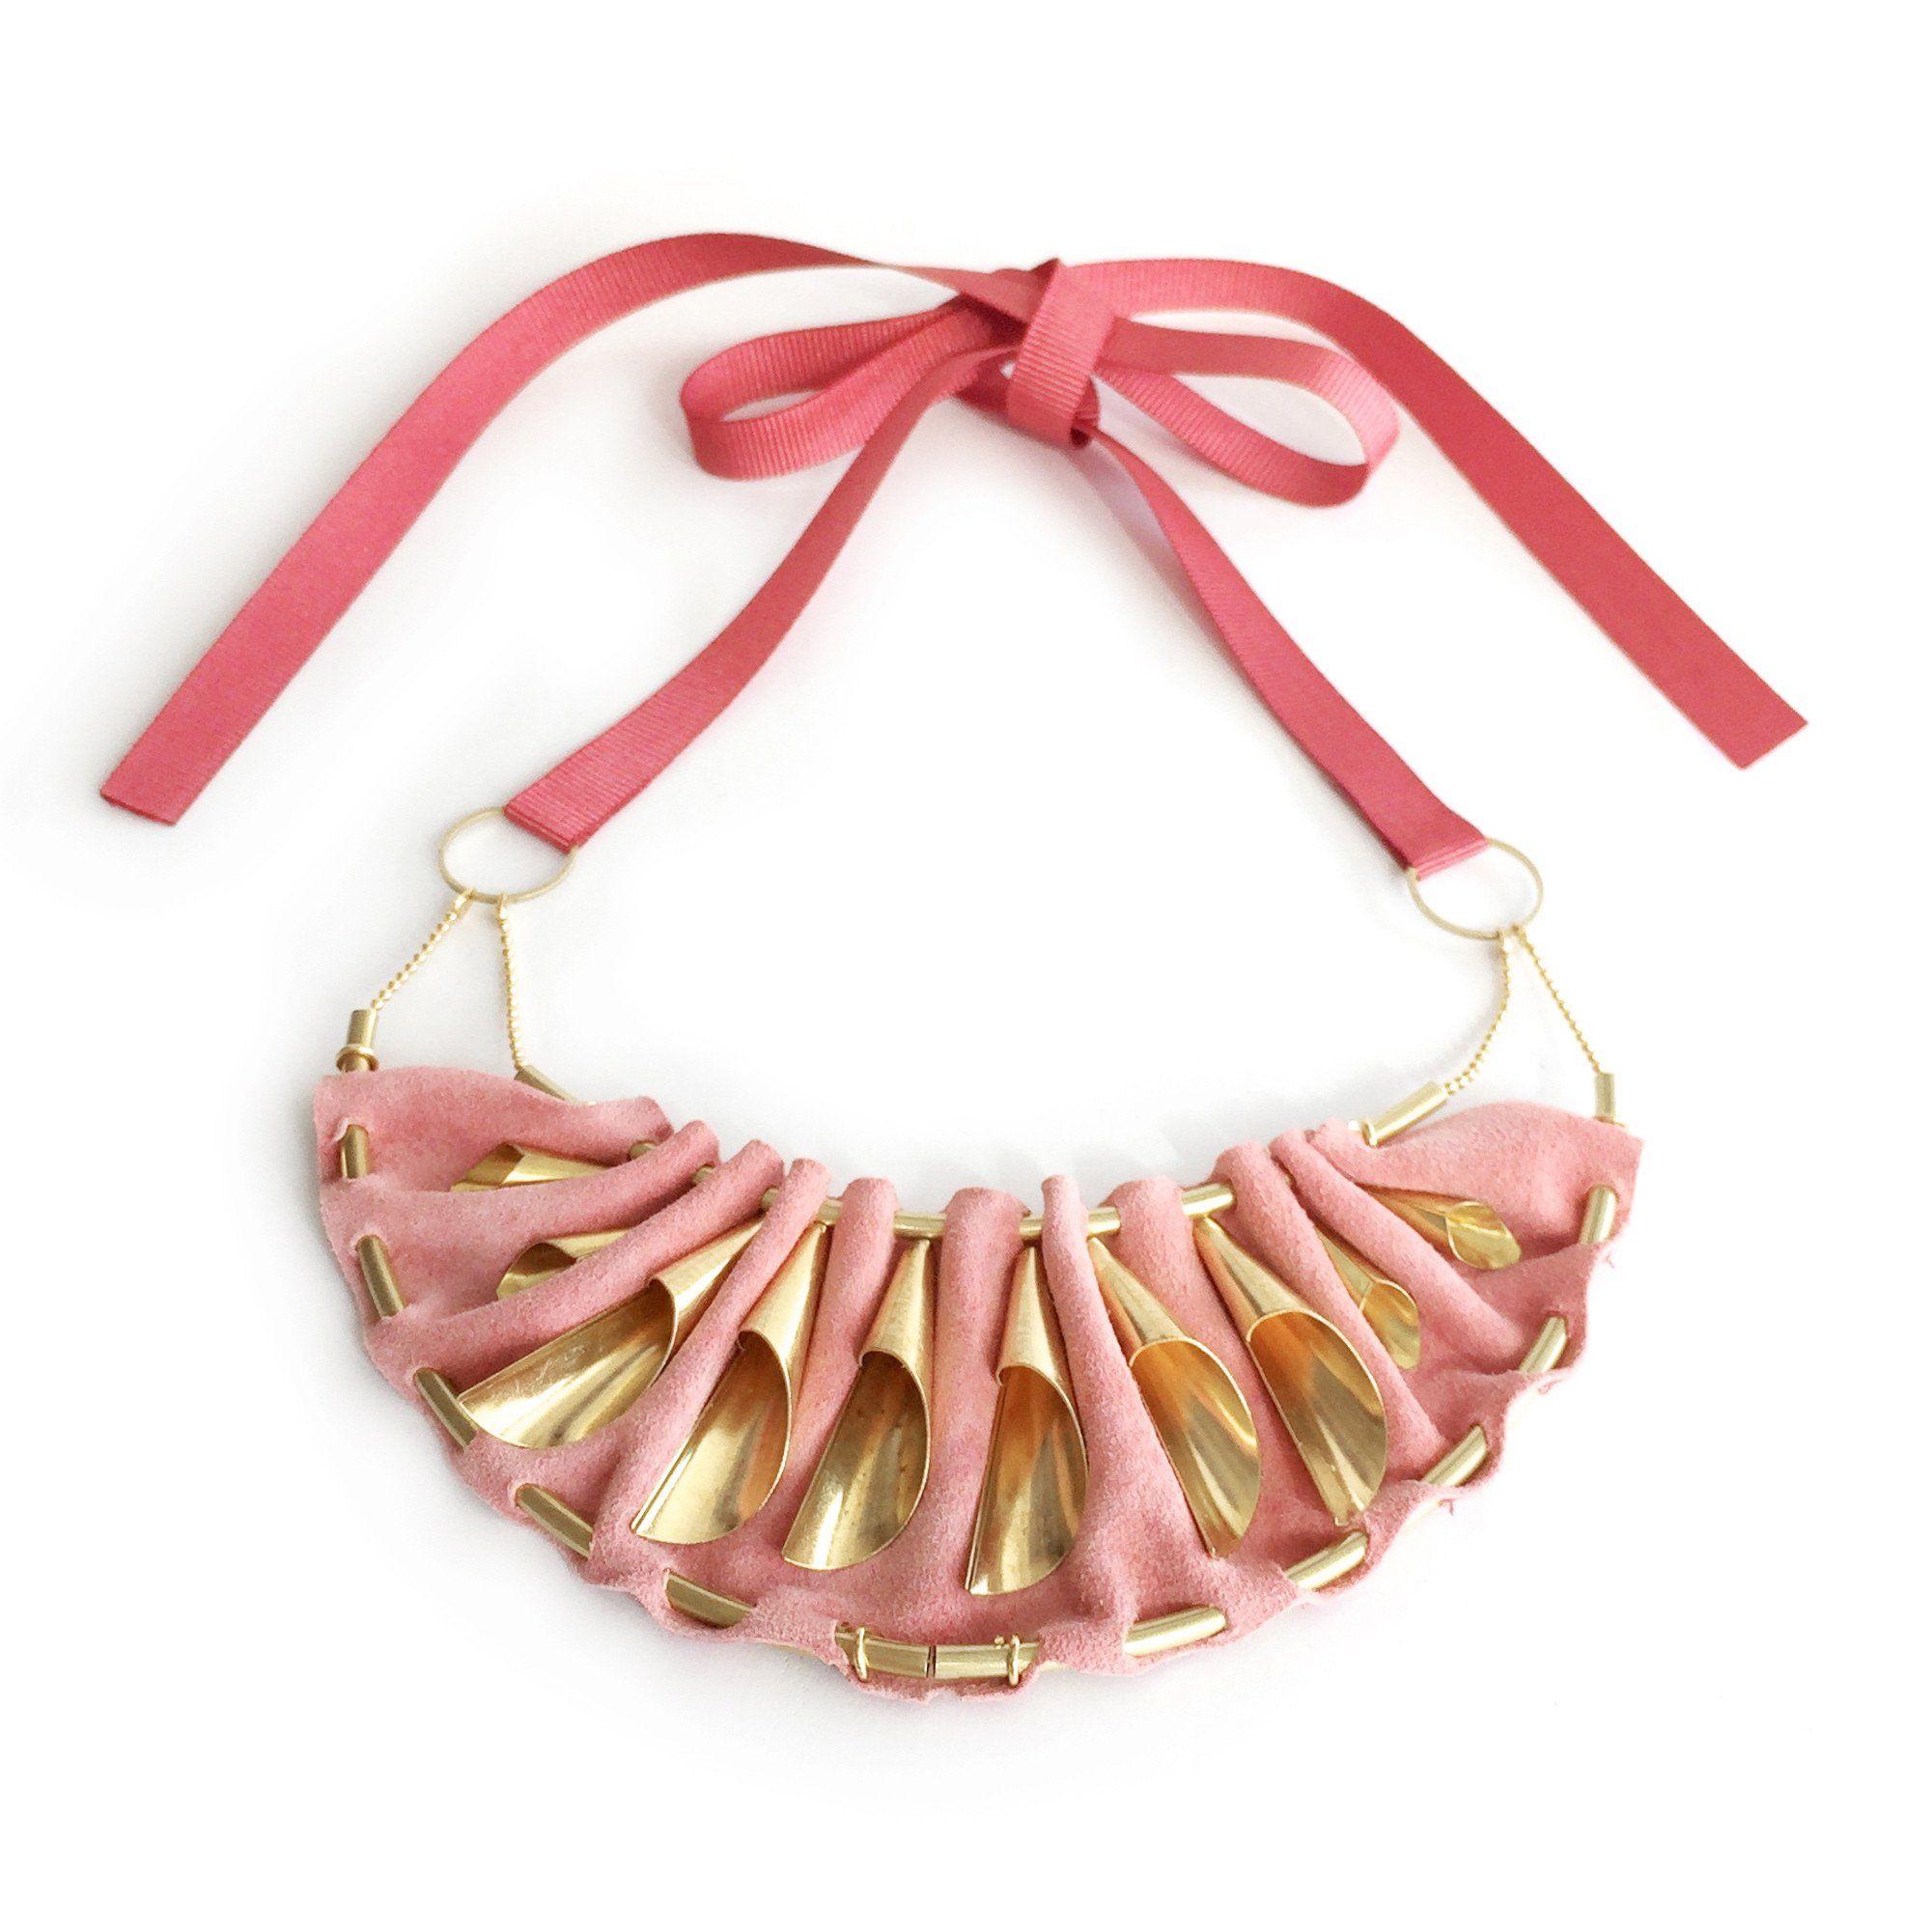 CRAZY LOVE statement necklace